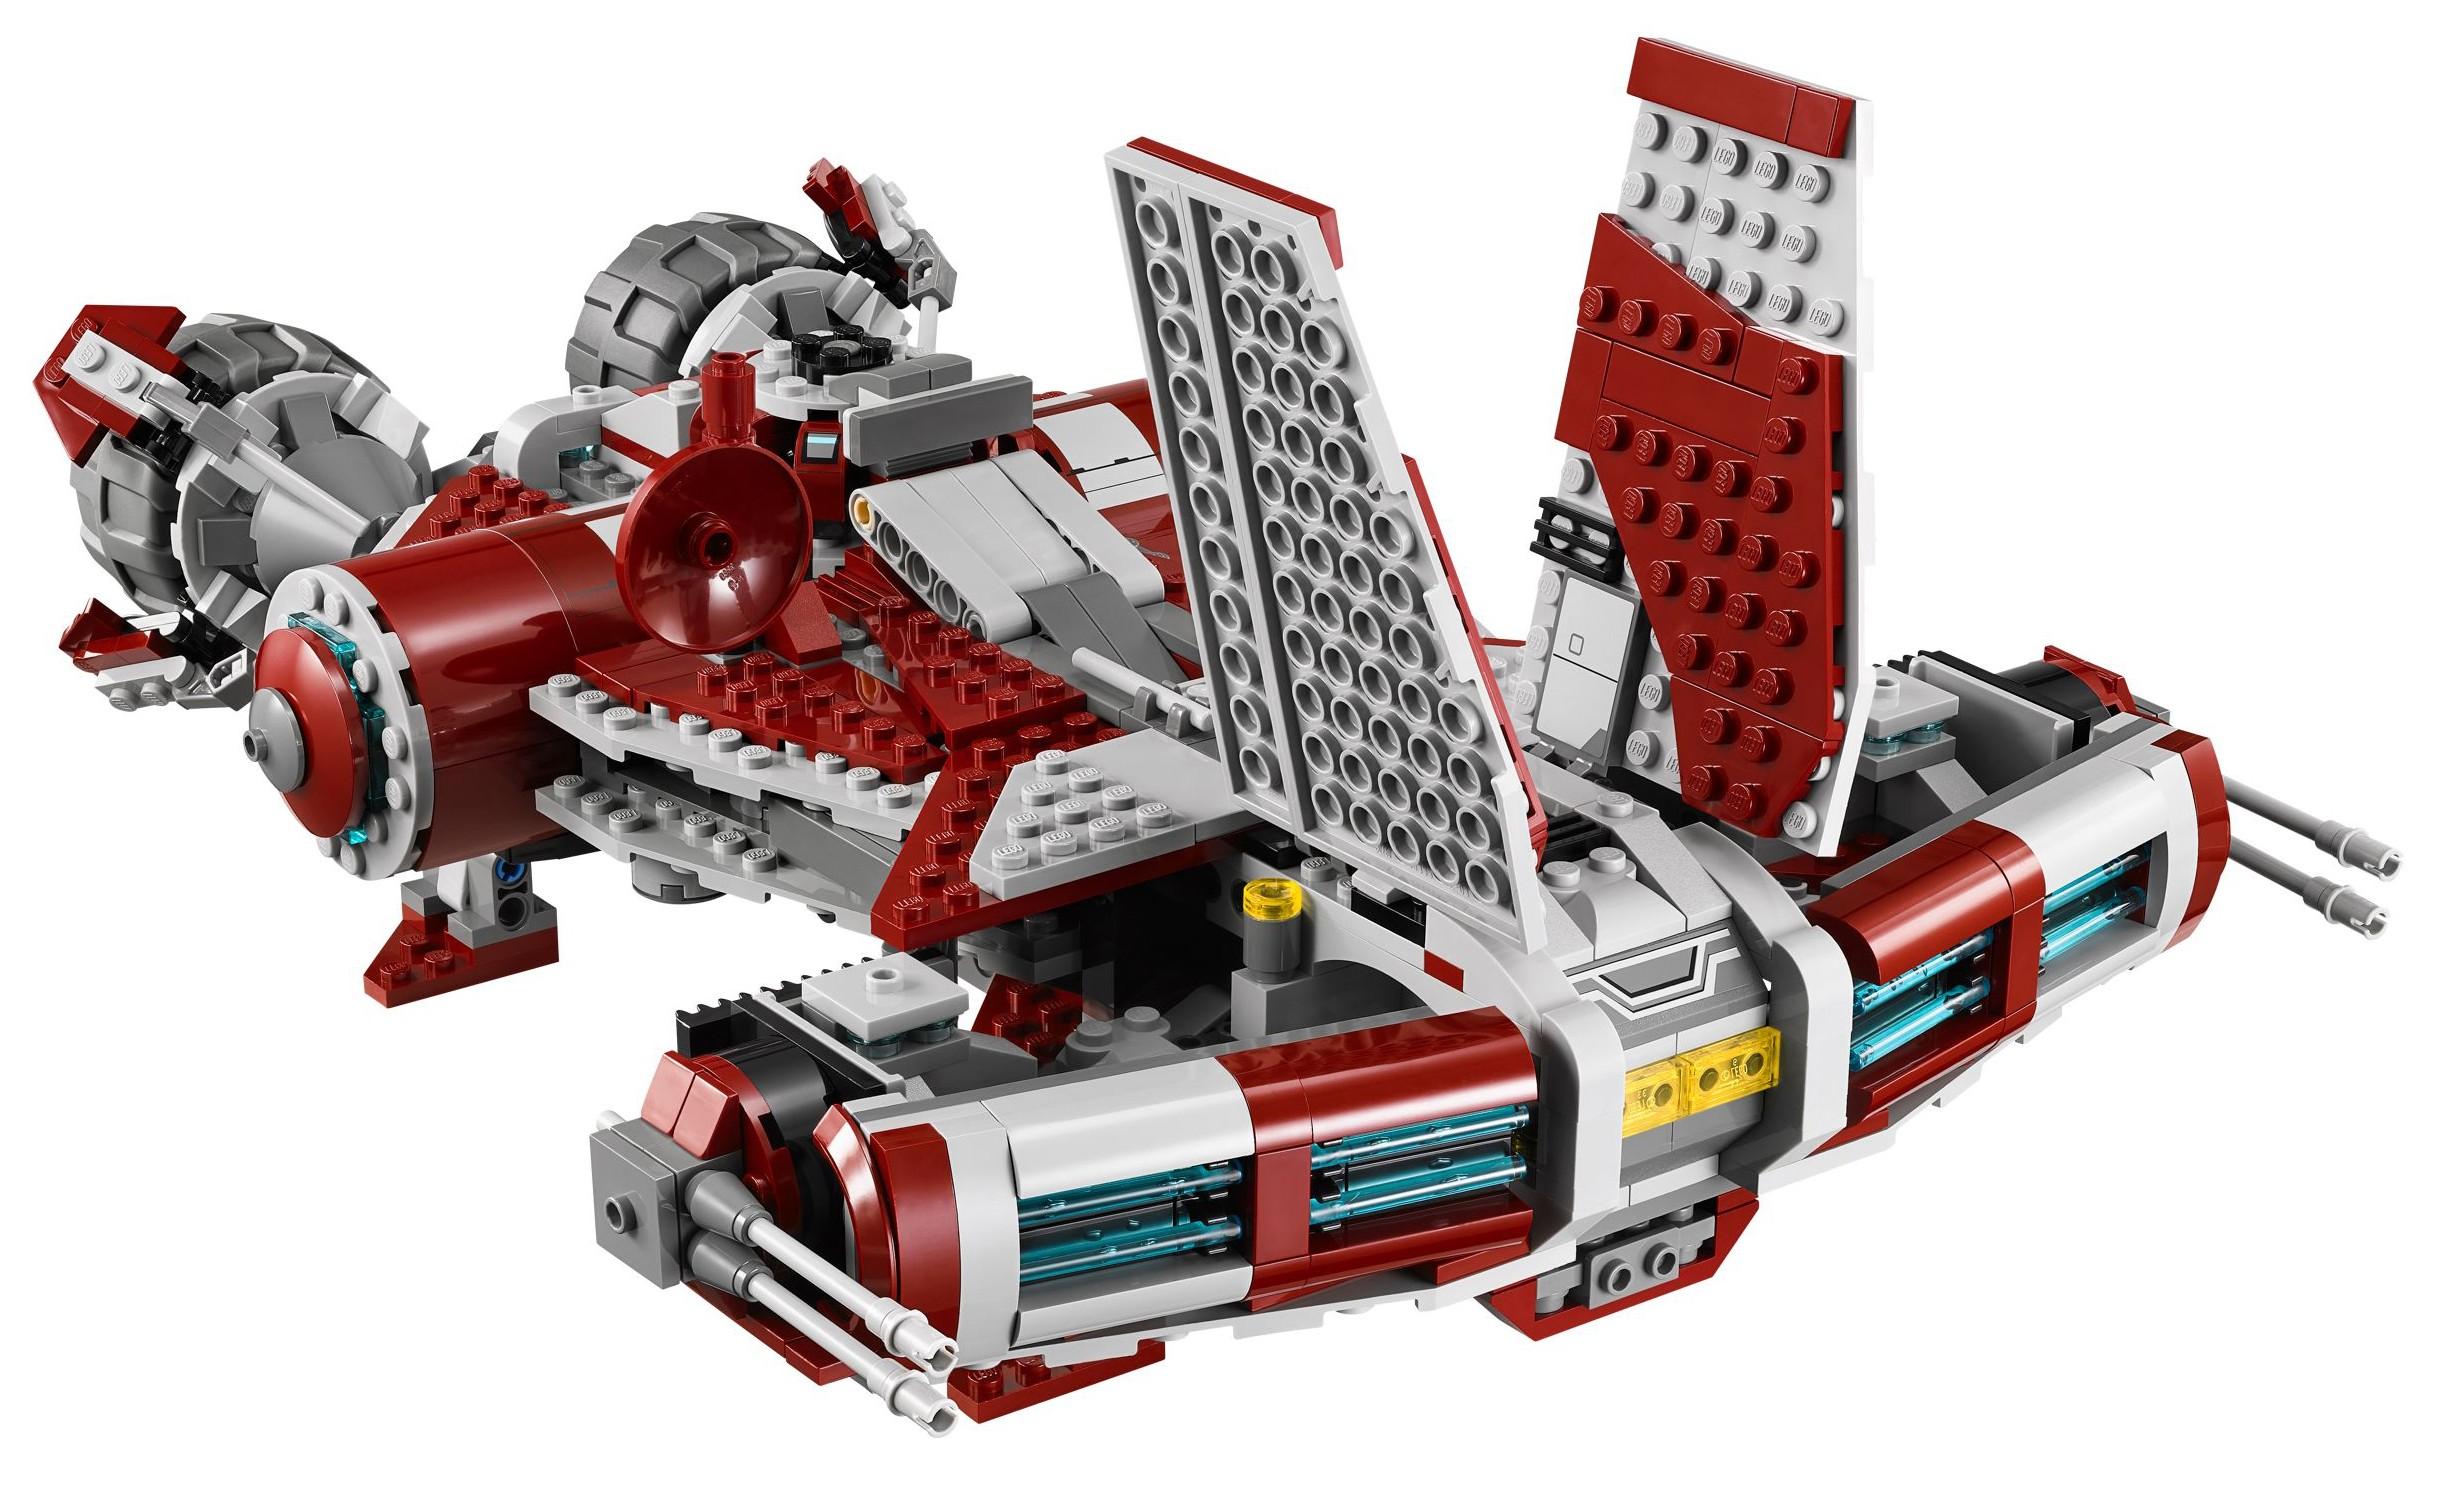 Star Wars Lego Toys : Summer lego star wars jedi defender class cruiser